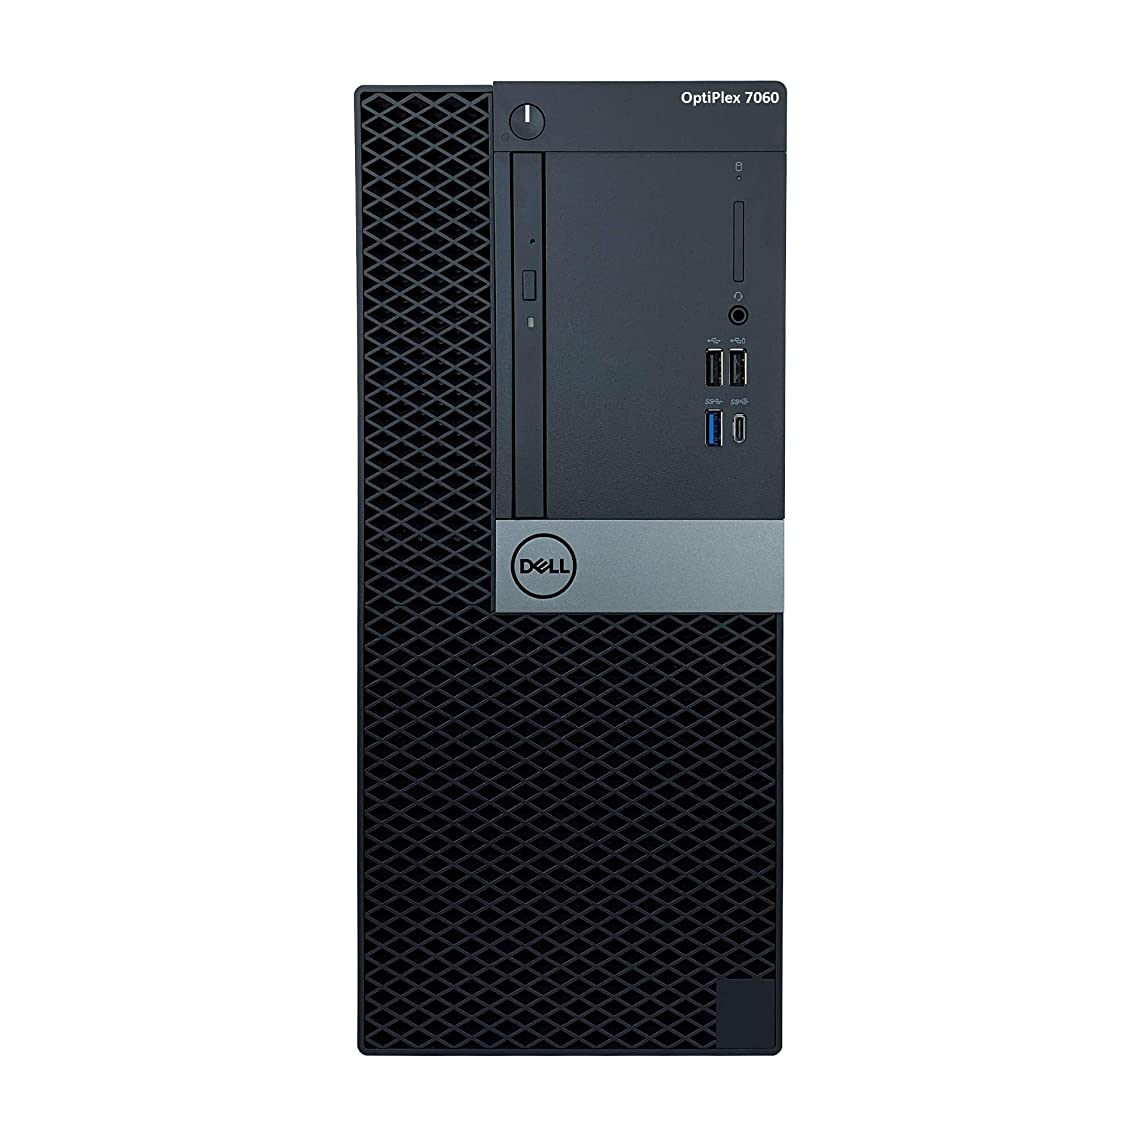 Dell Optiplex 5060 Tower Desktop - 8th Gen Intel Core i5-8500 3.00GHz (Up to 4.10GHz), 8GB DDR4 2666MHz Memory, 1TB SSD + 3TB 7200 RPM Hard Drive, Intel UHD Graphics 630, Windows 10 Pro